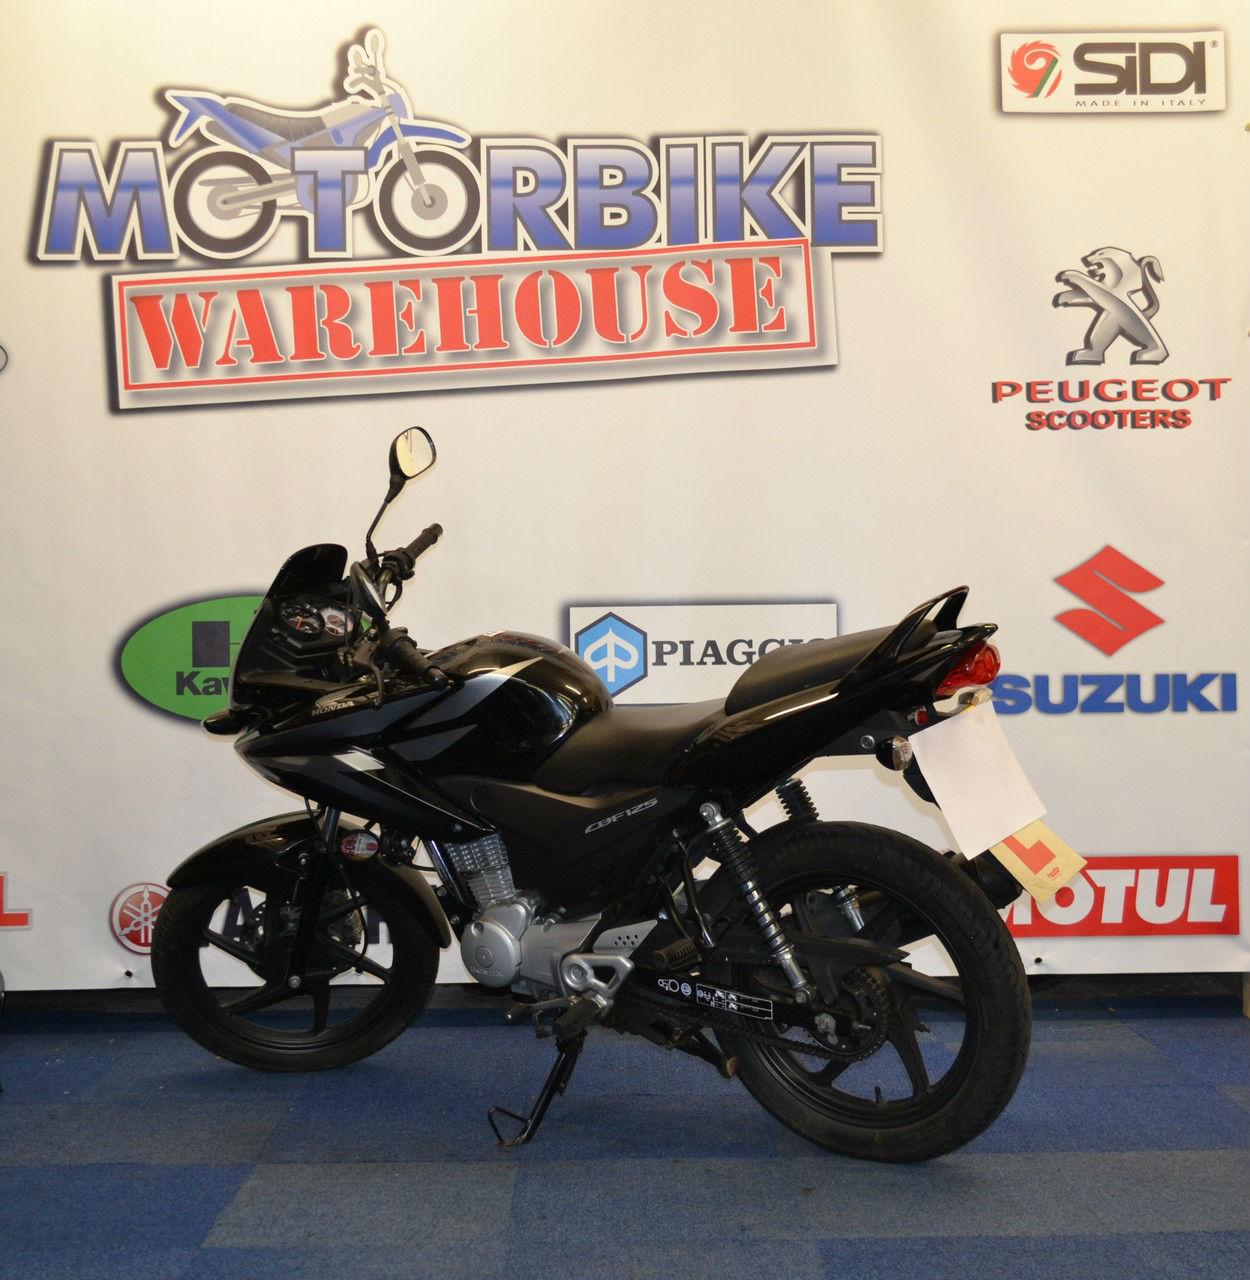 Honda Crf 125 Price: 2012 Honda CBF 125cc Learner Legal Motorcycle